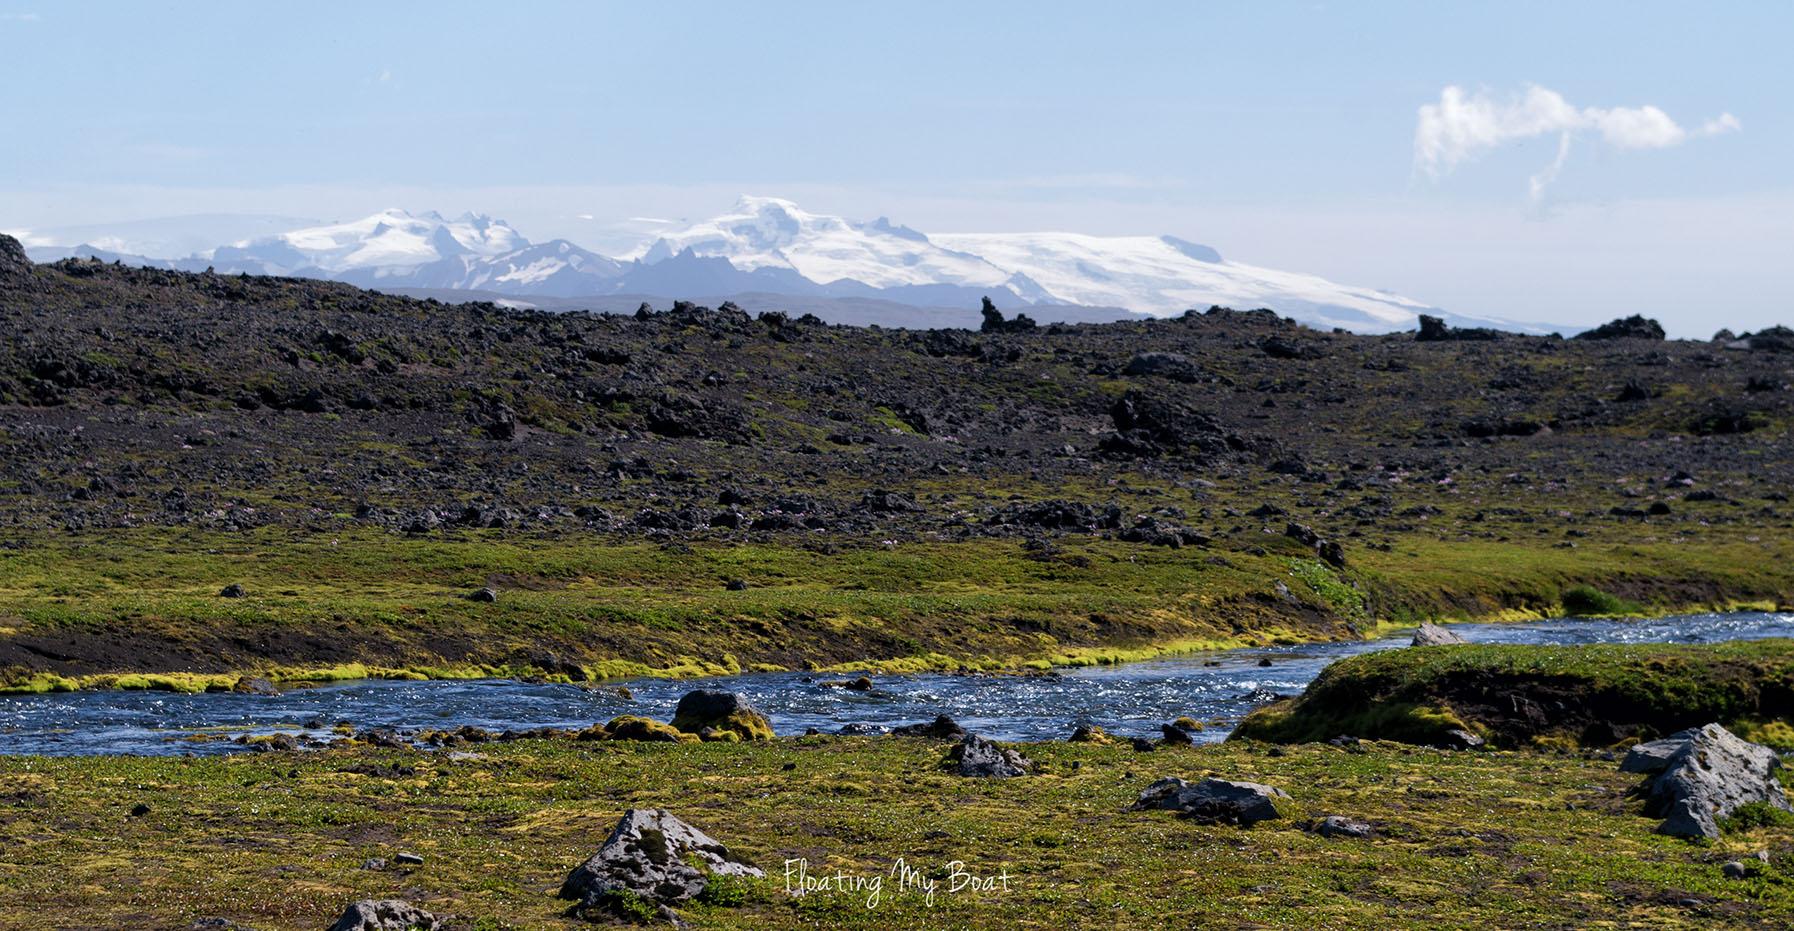 trekking-iceland-vatnajokull-national-park-49